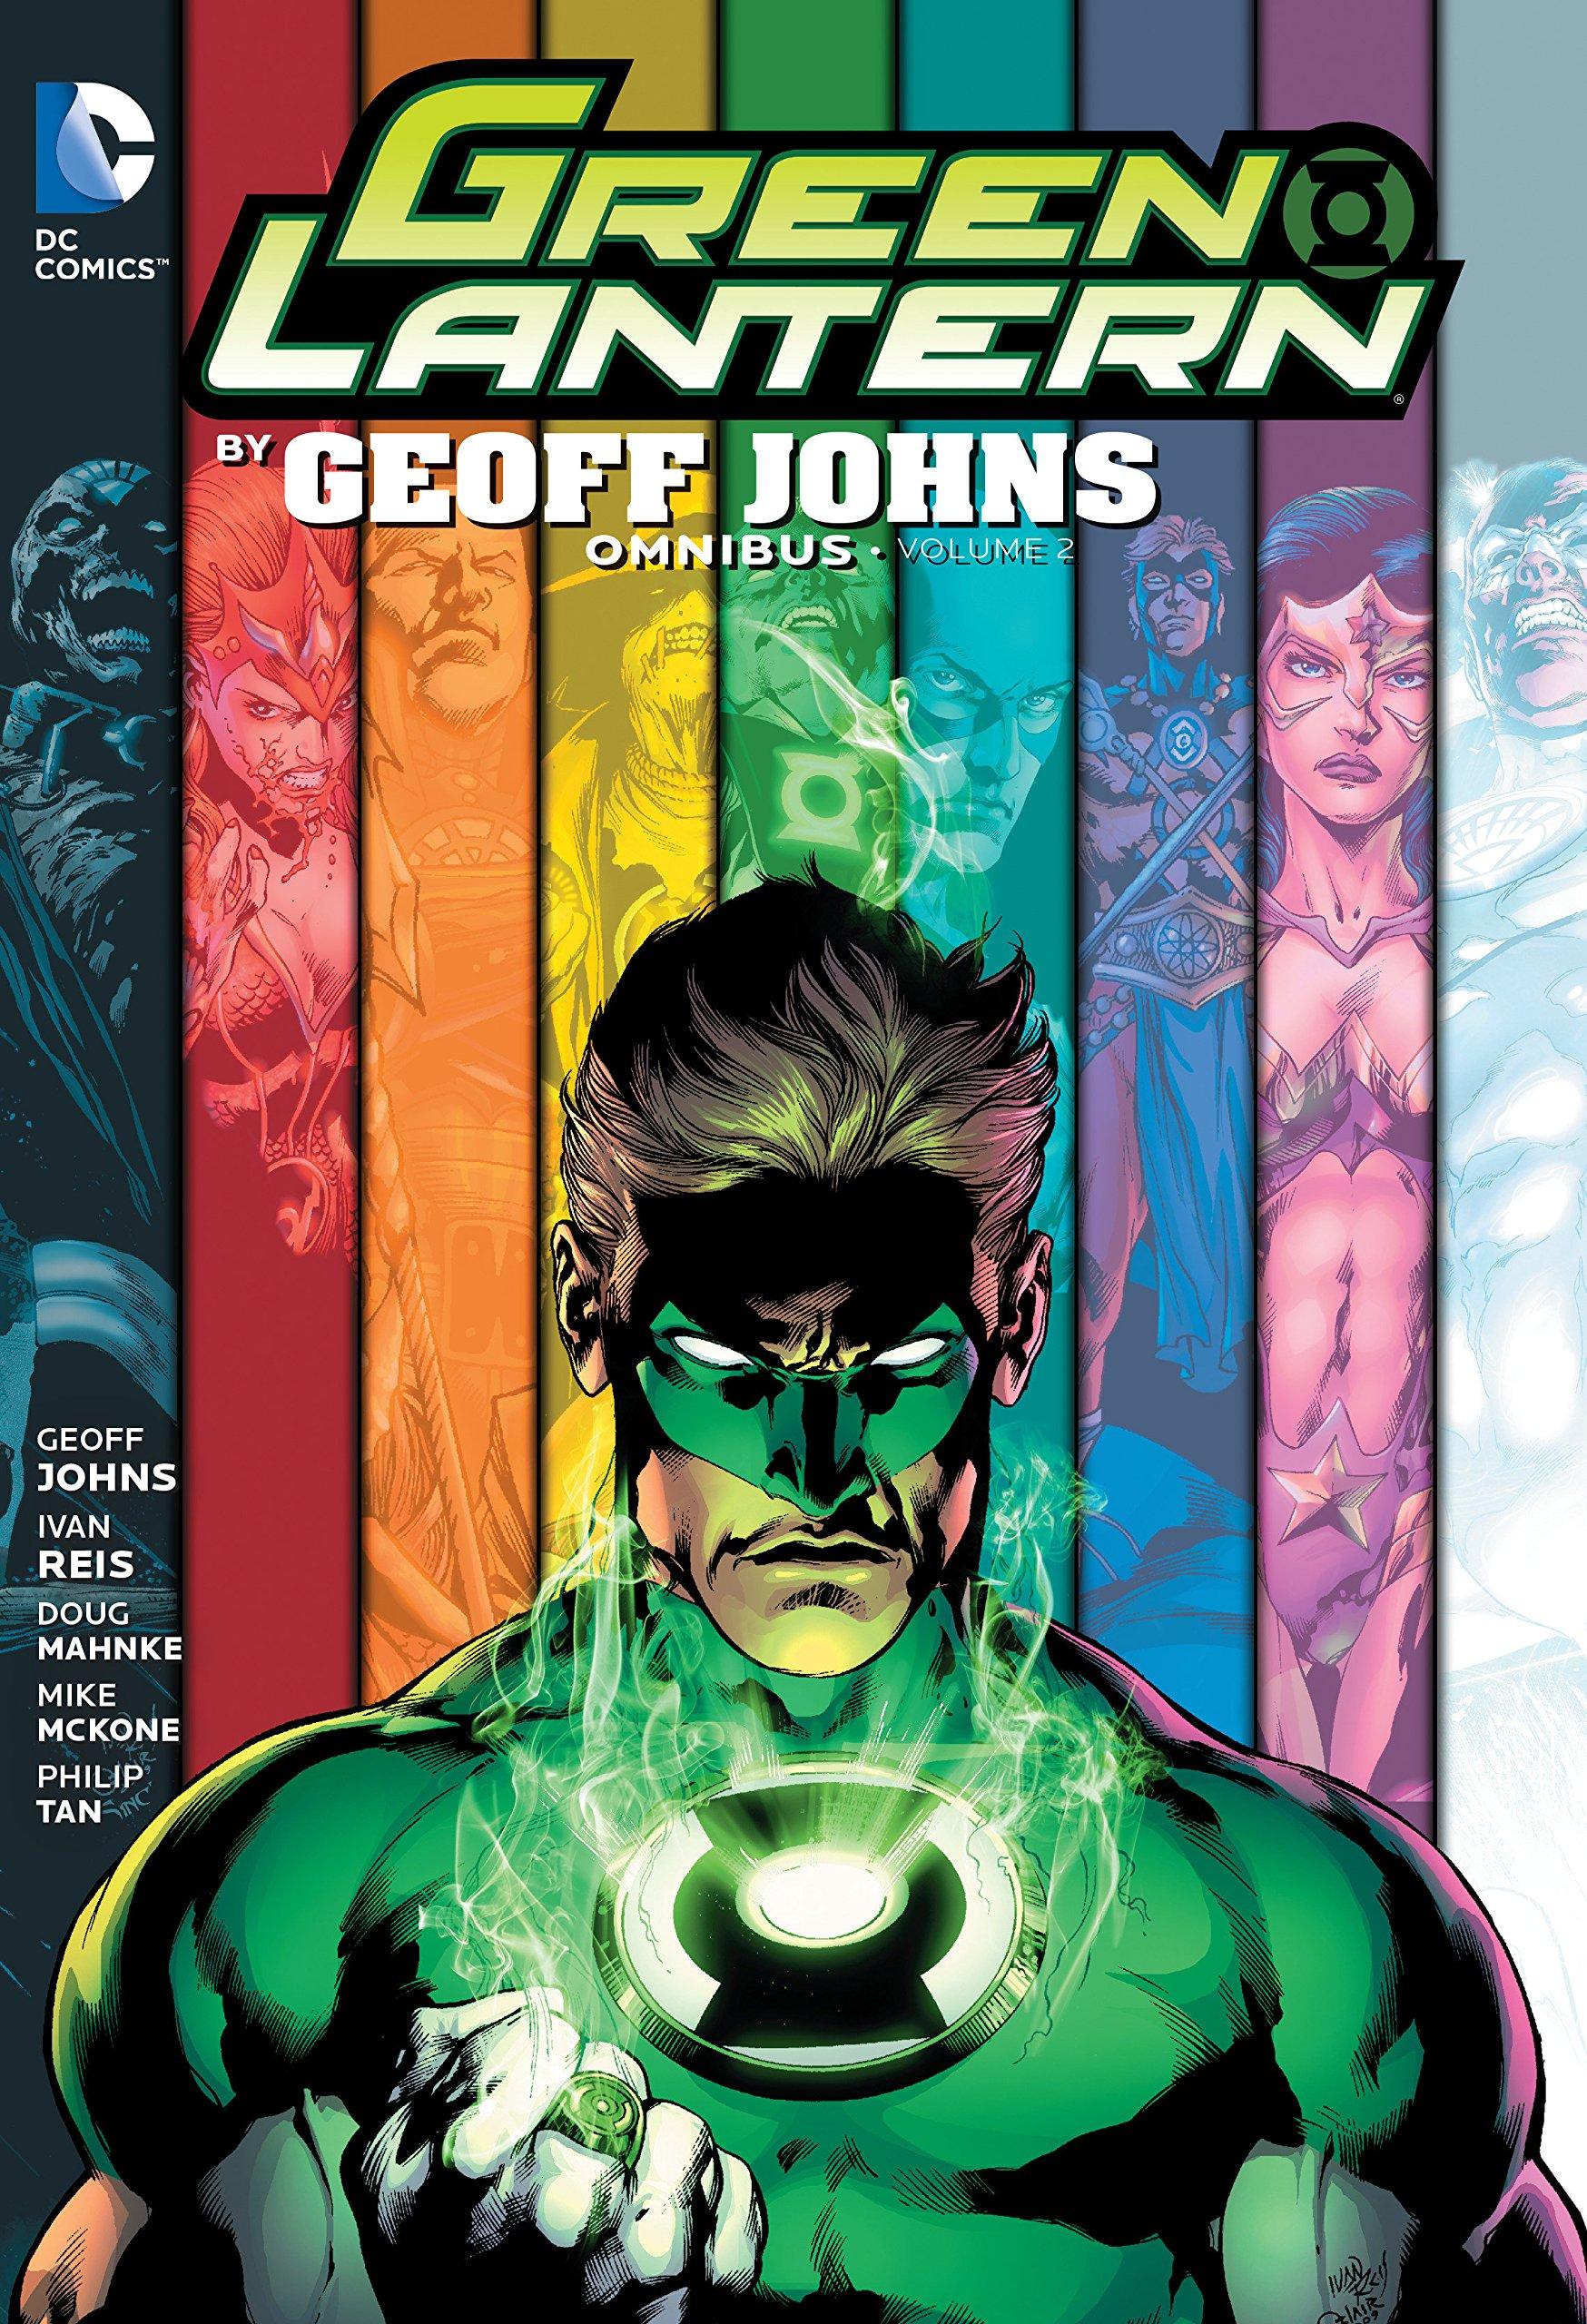 Green Lantern by Geoff Johns Omnibus Vol. 2 by DC Comics